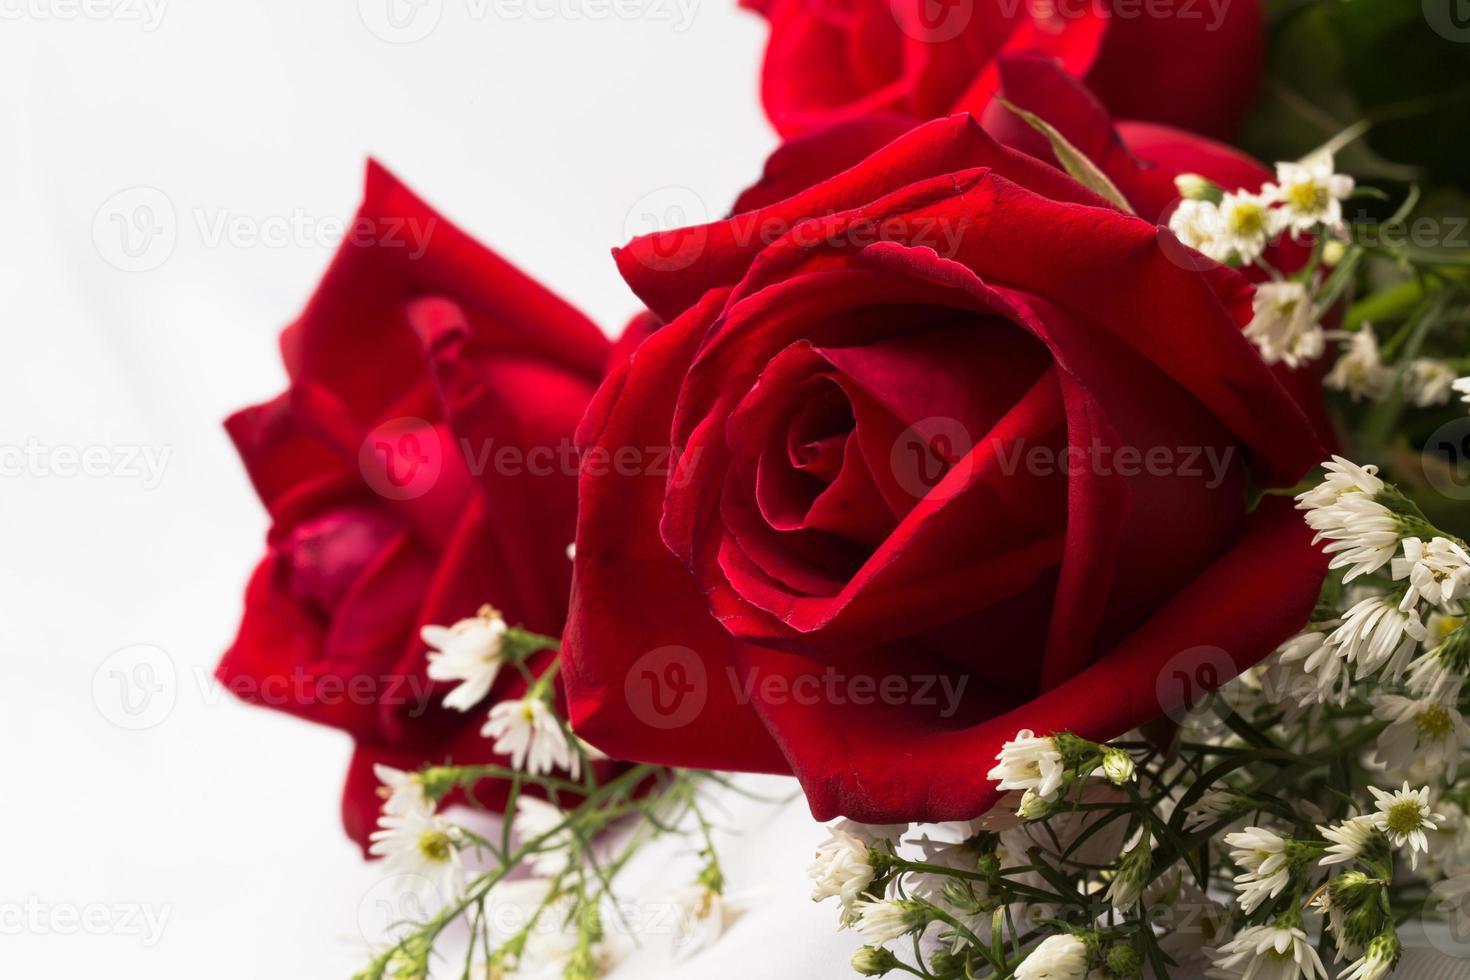 Holland rozen close-up foto